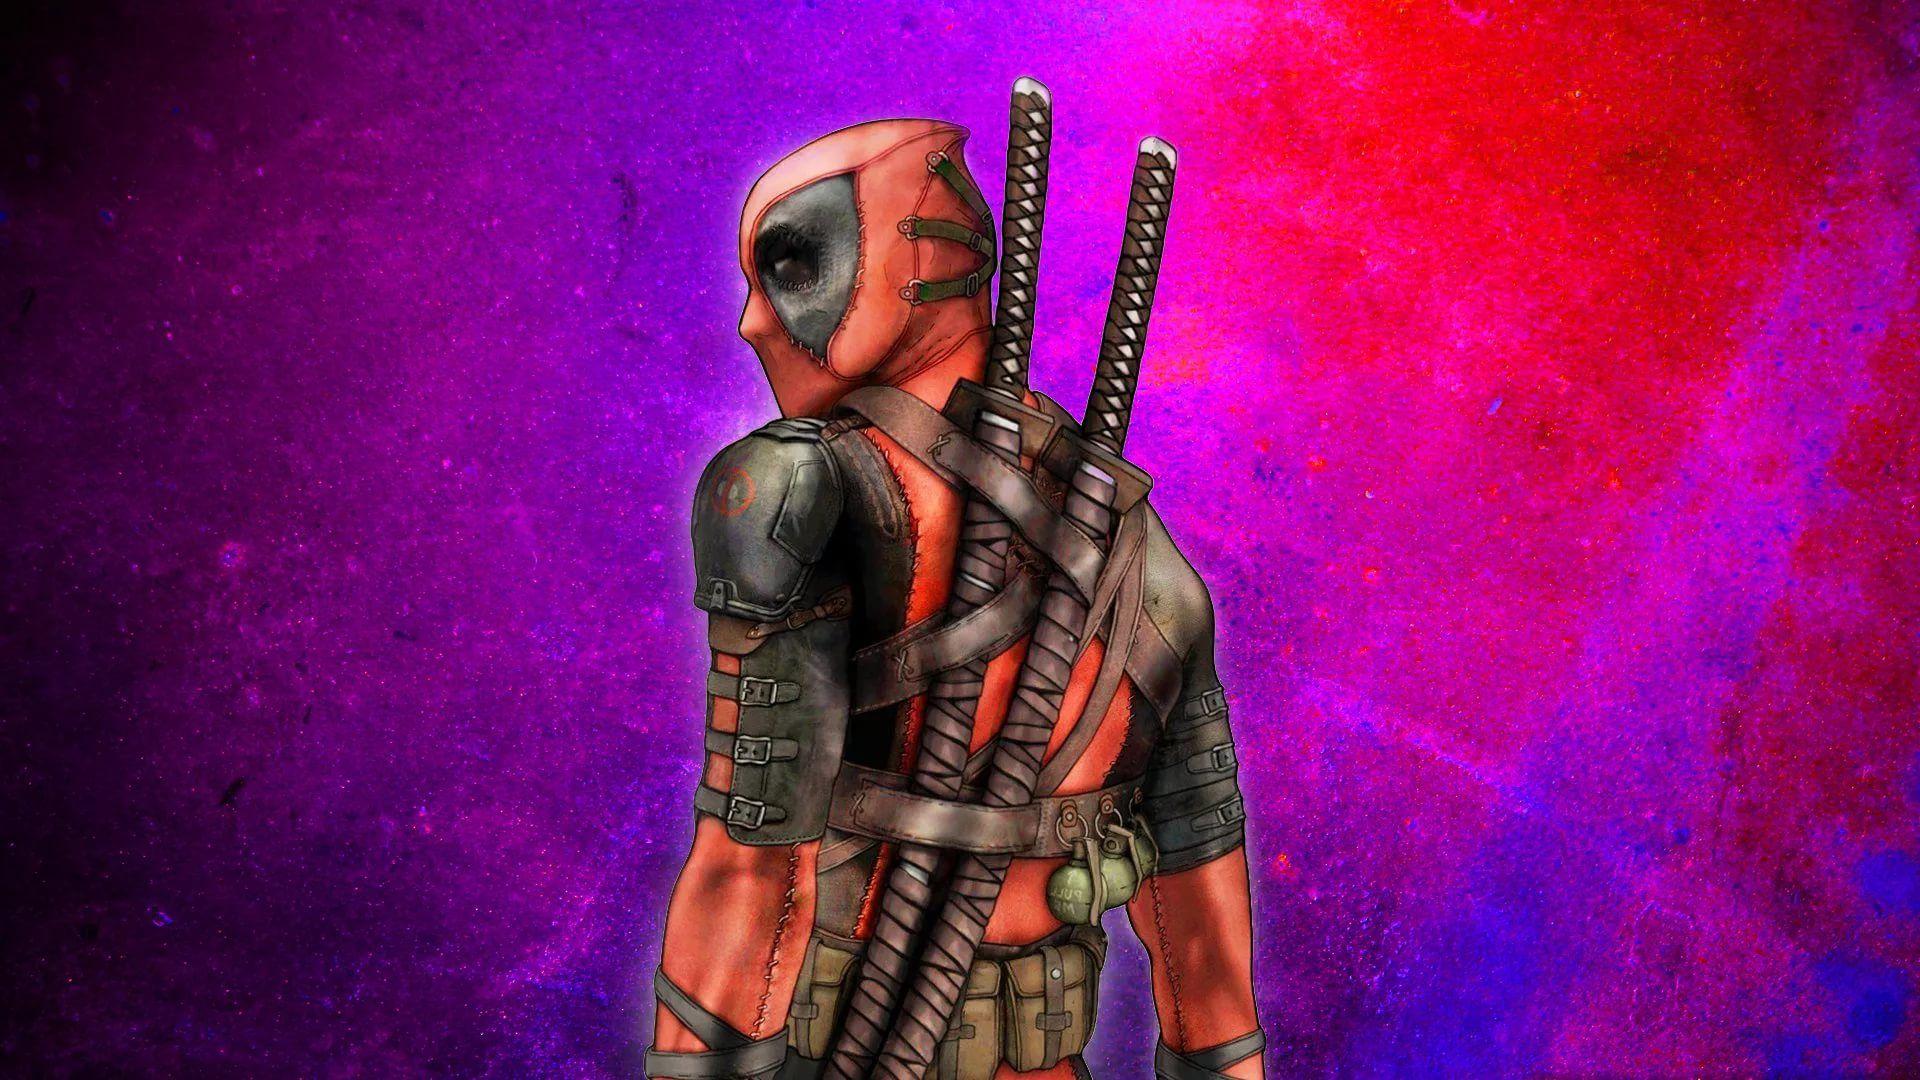 Cool Deadpool HD Desktop Wallpaper